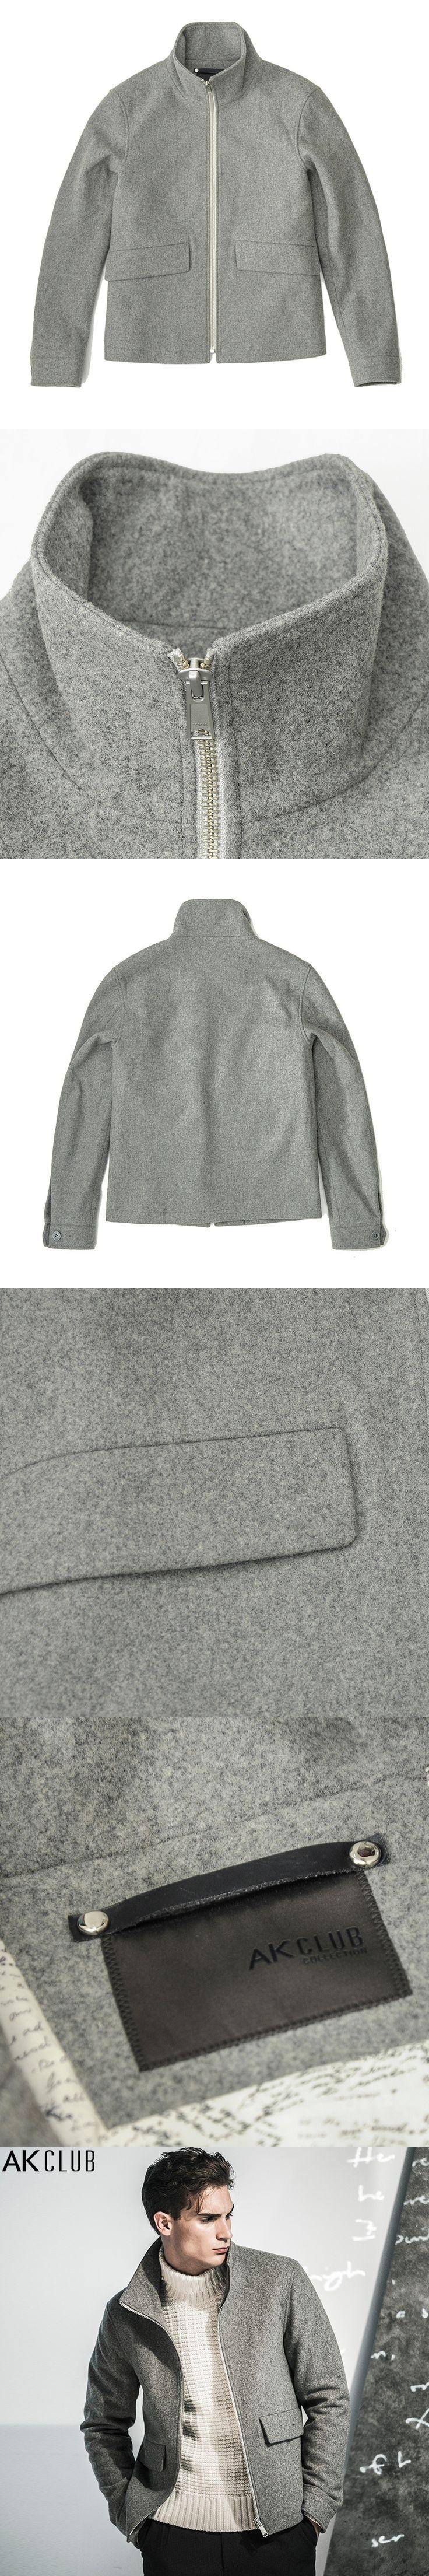 AK CLUB Brand Men 70% Wool Jacket Runway Letters Home Series Short Woolen Coat Men Turn-down Collar Zipper Men Jacket 1704119